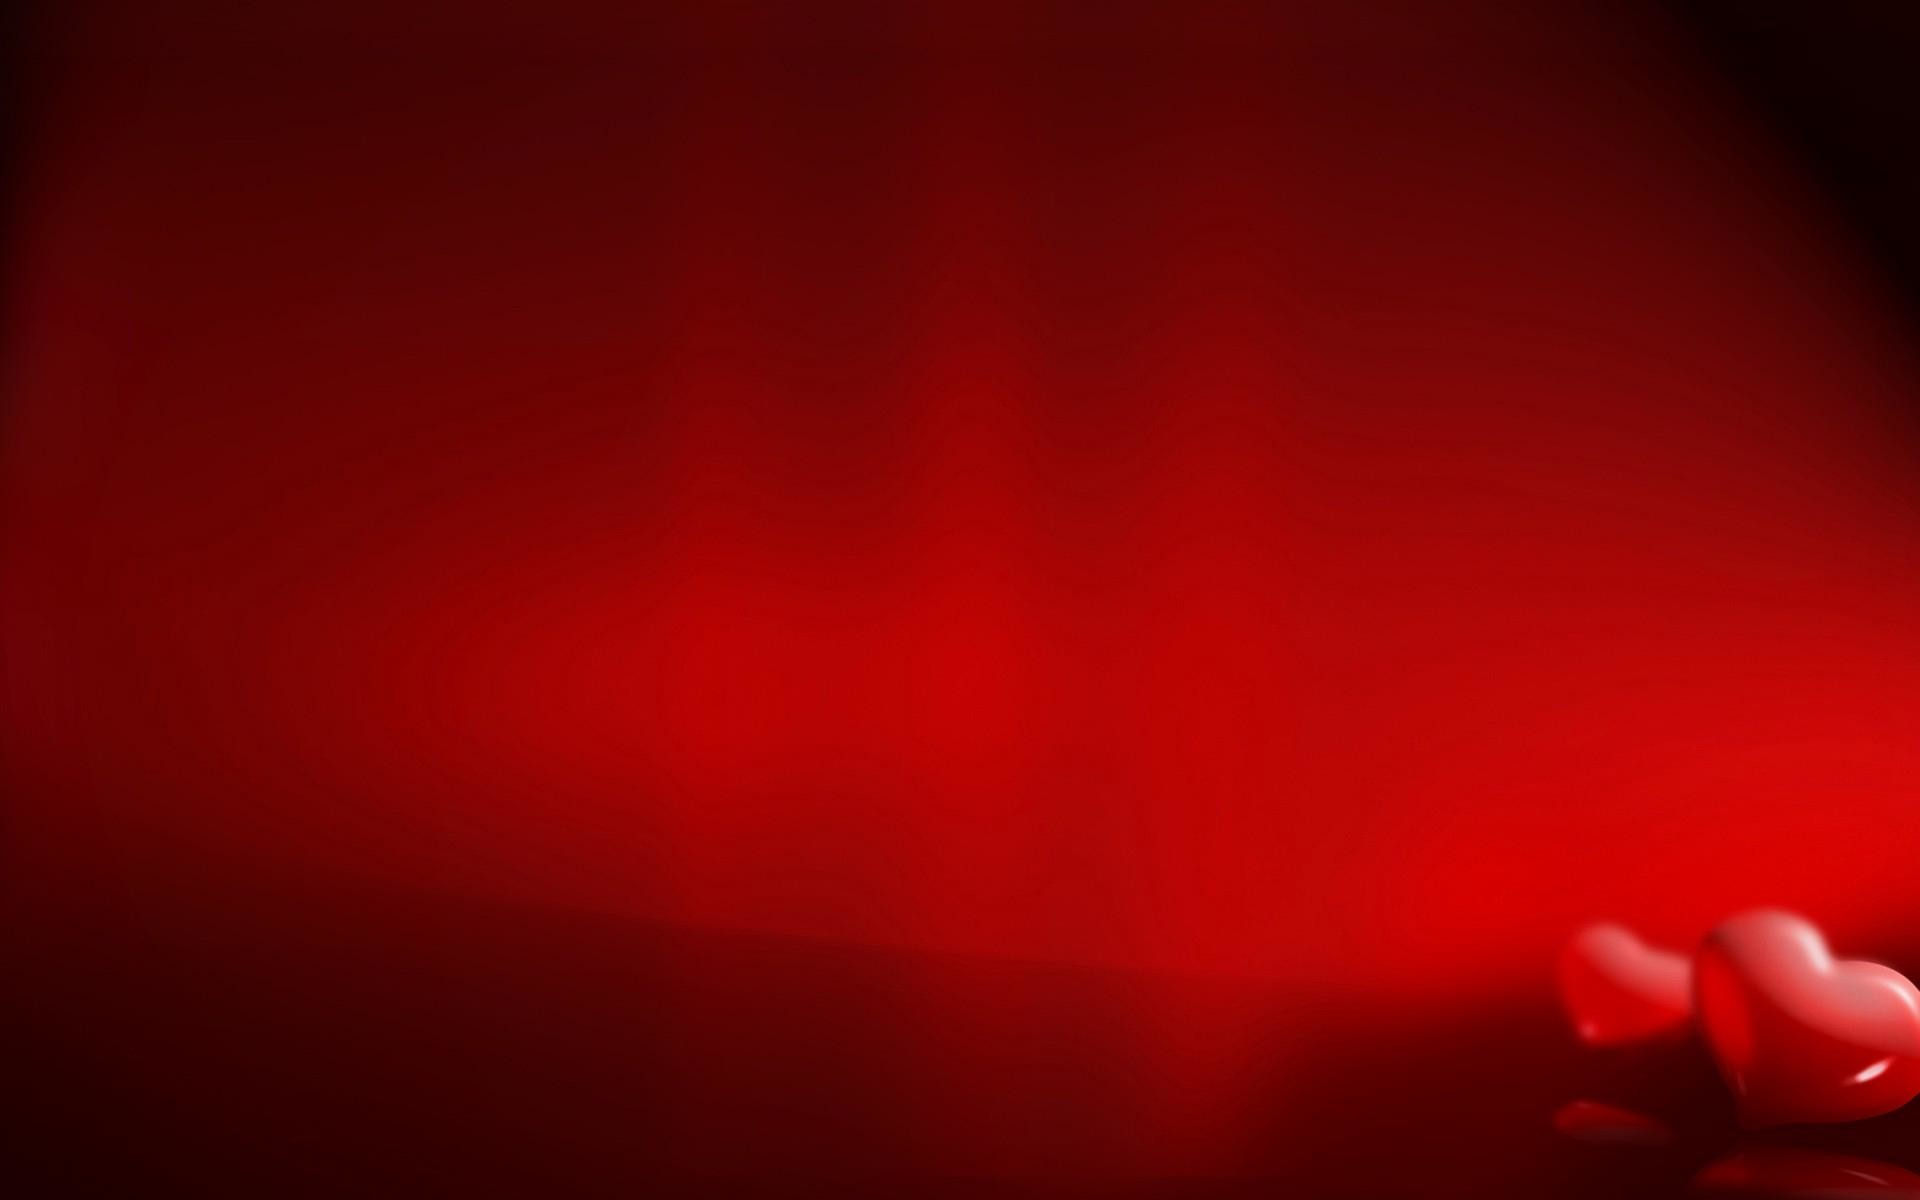 wallpaper.wiki-Atartling-valentines-day-wallpaper-download-PIC-